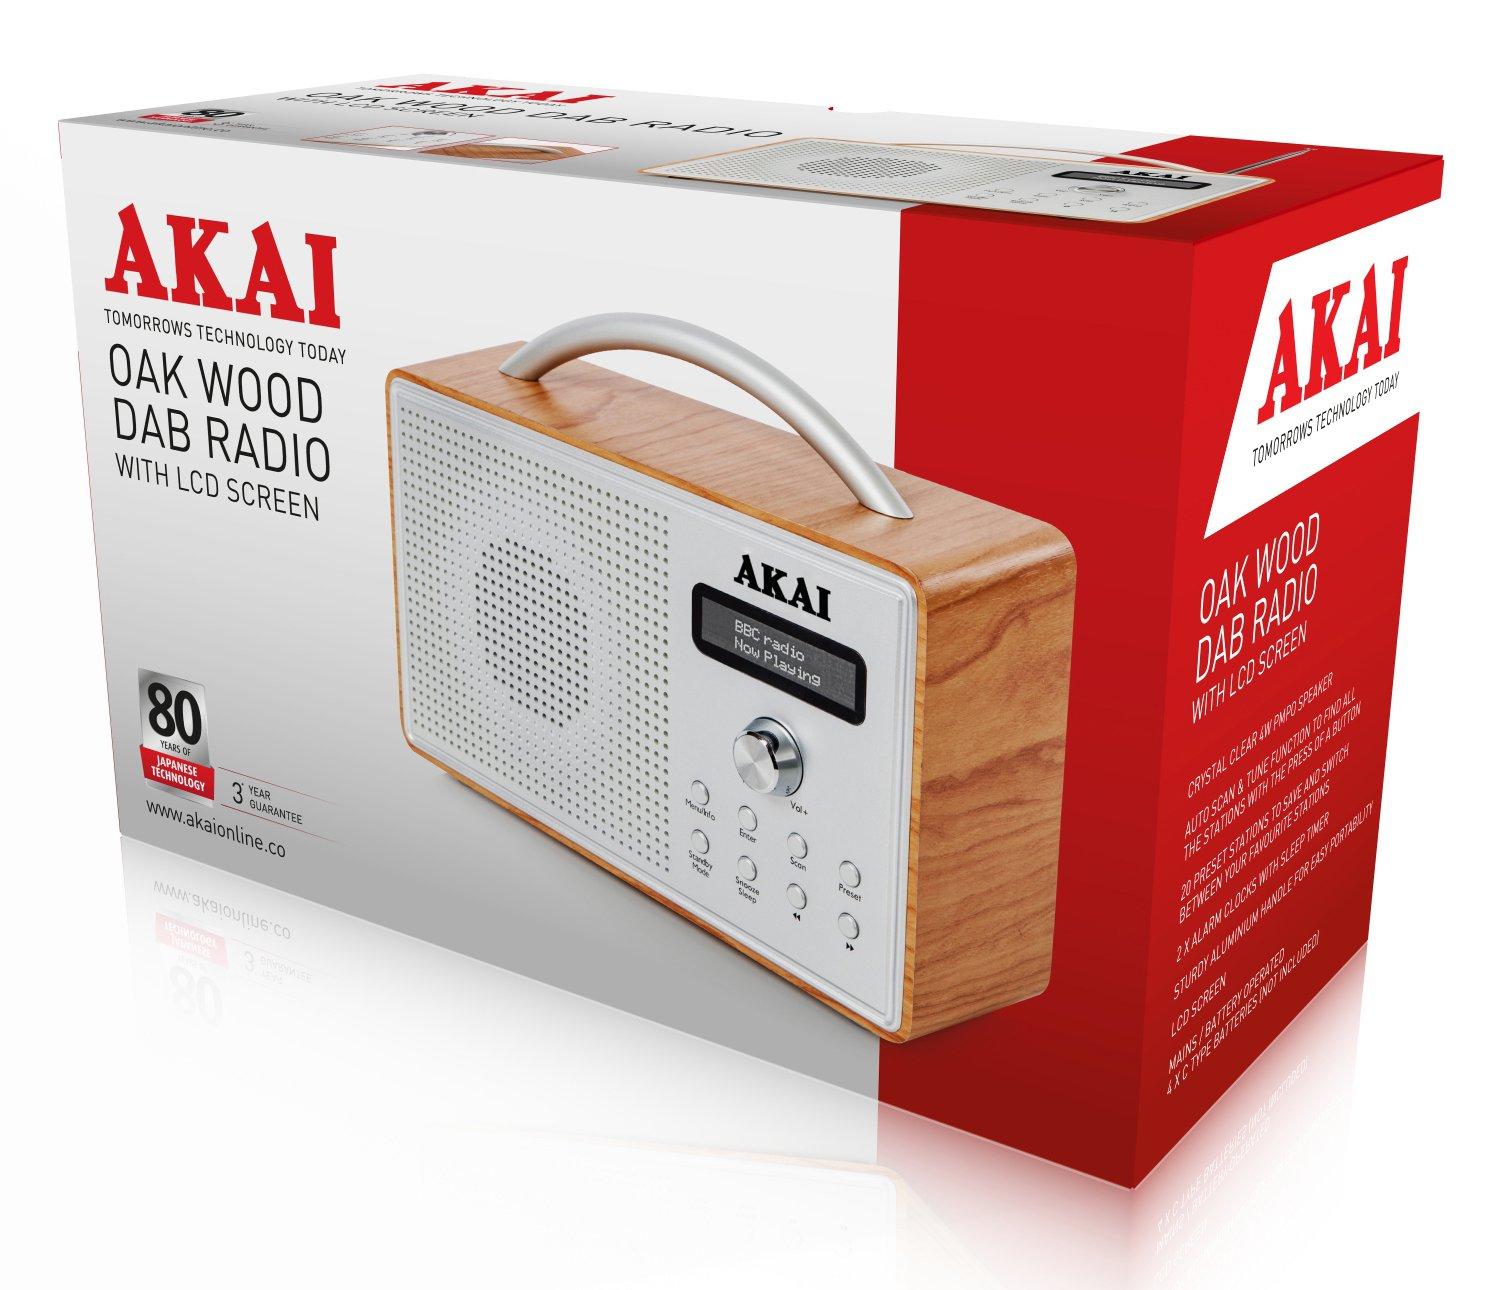 Akai Wood Dab Radio Oak With Lcd At Barnitts Online Store